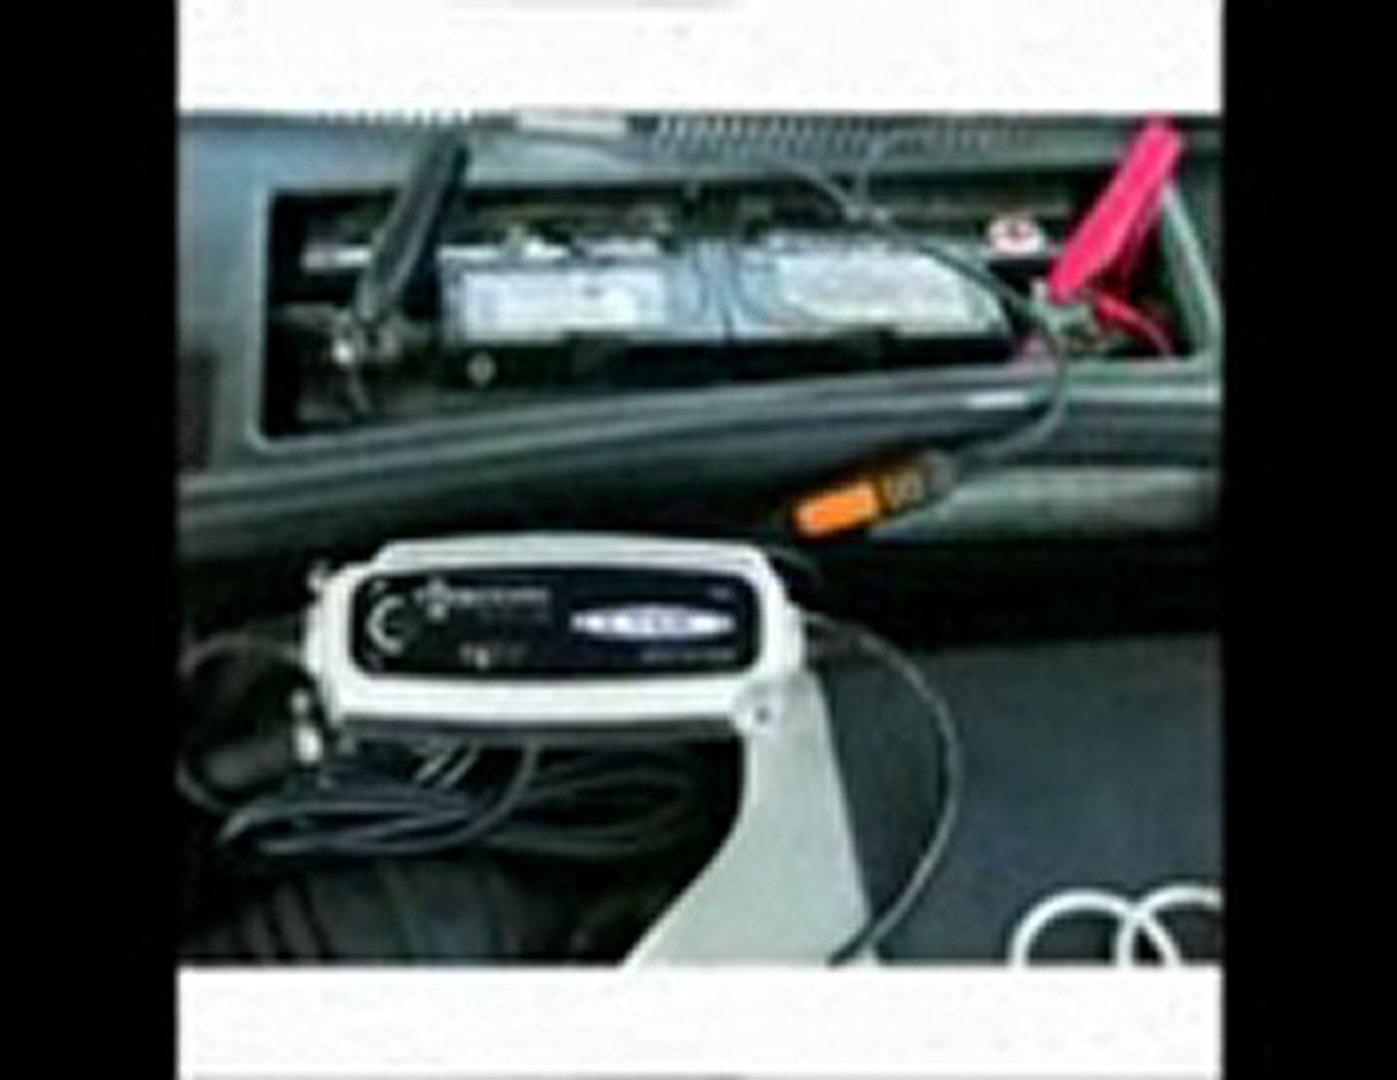 Uitgelezene Best Seller CTEK Multi XS 4003 Batterie-Ladegerät - video dailymotion EJ-49